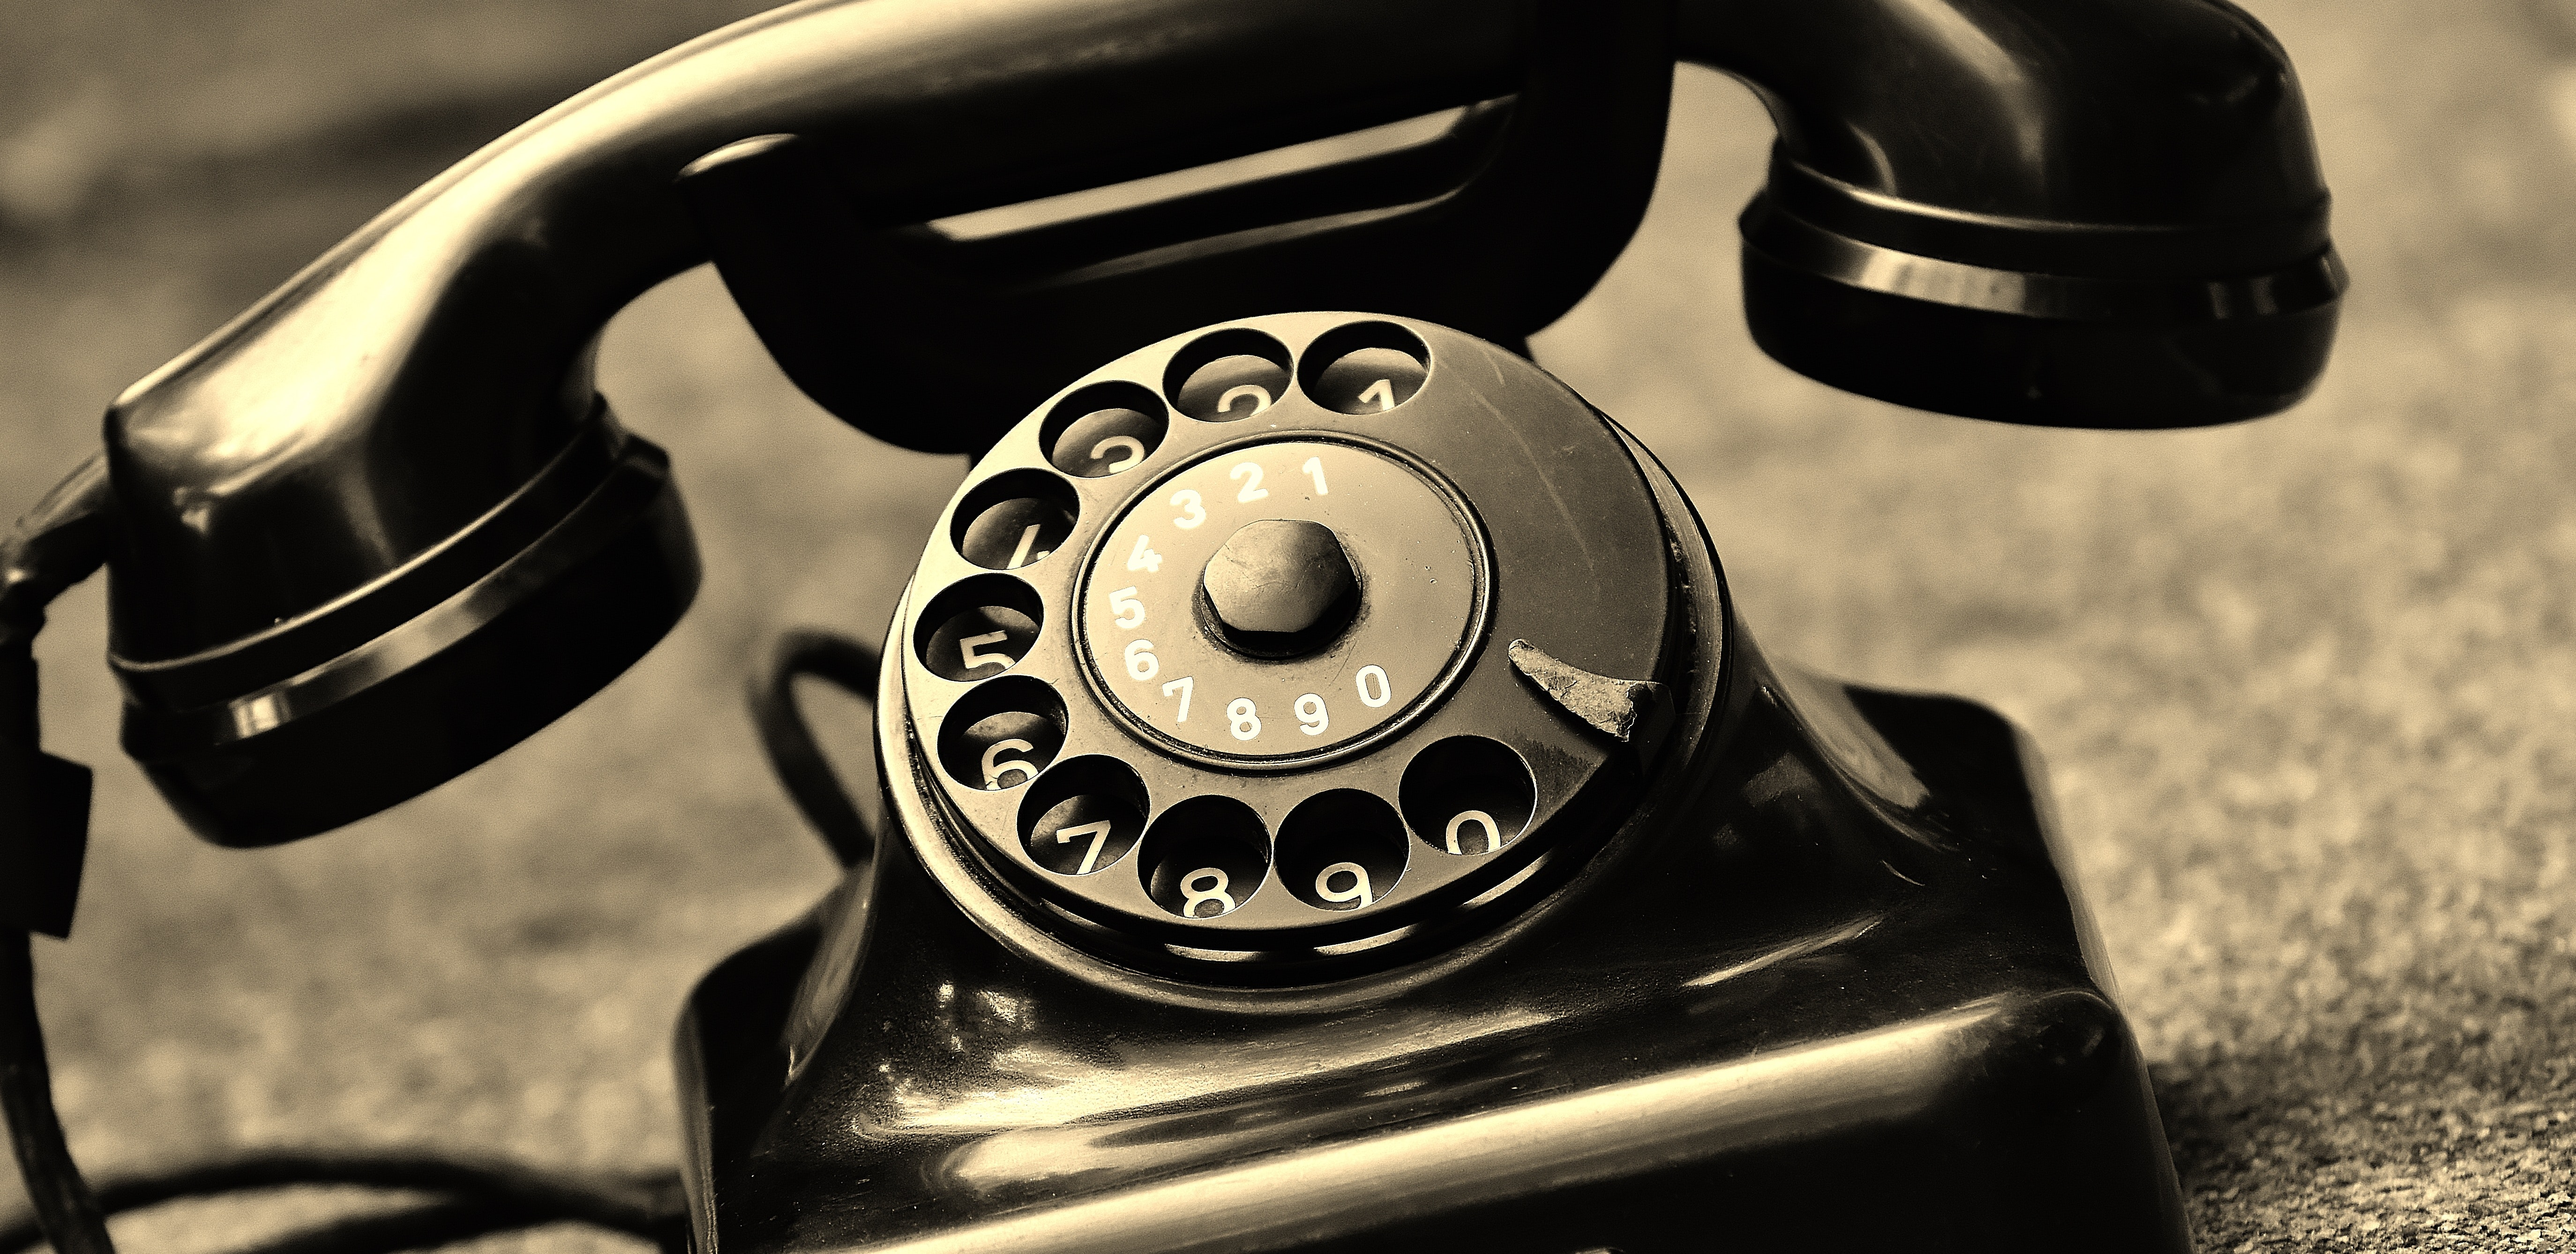 Black Vintage Telephone, Antique, Black-and-white, Classic, Phone, HQ Photo